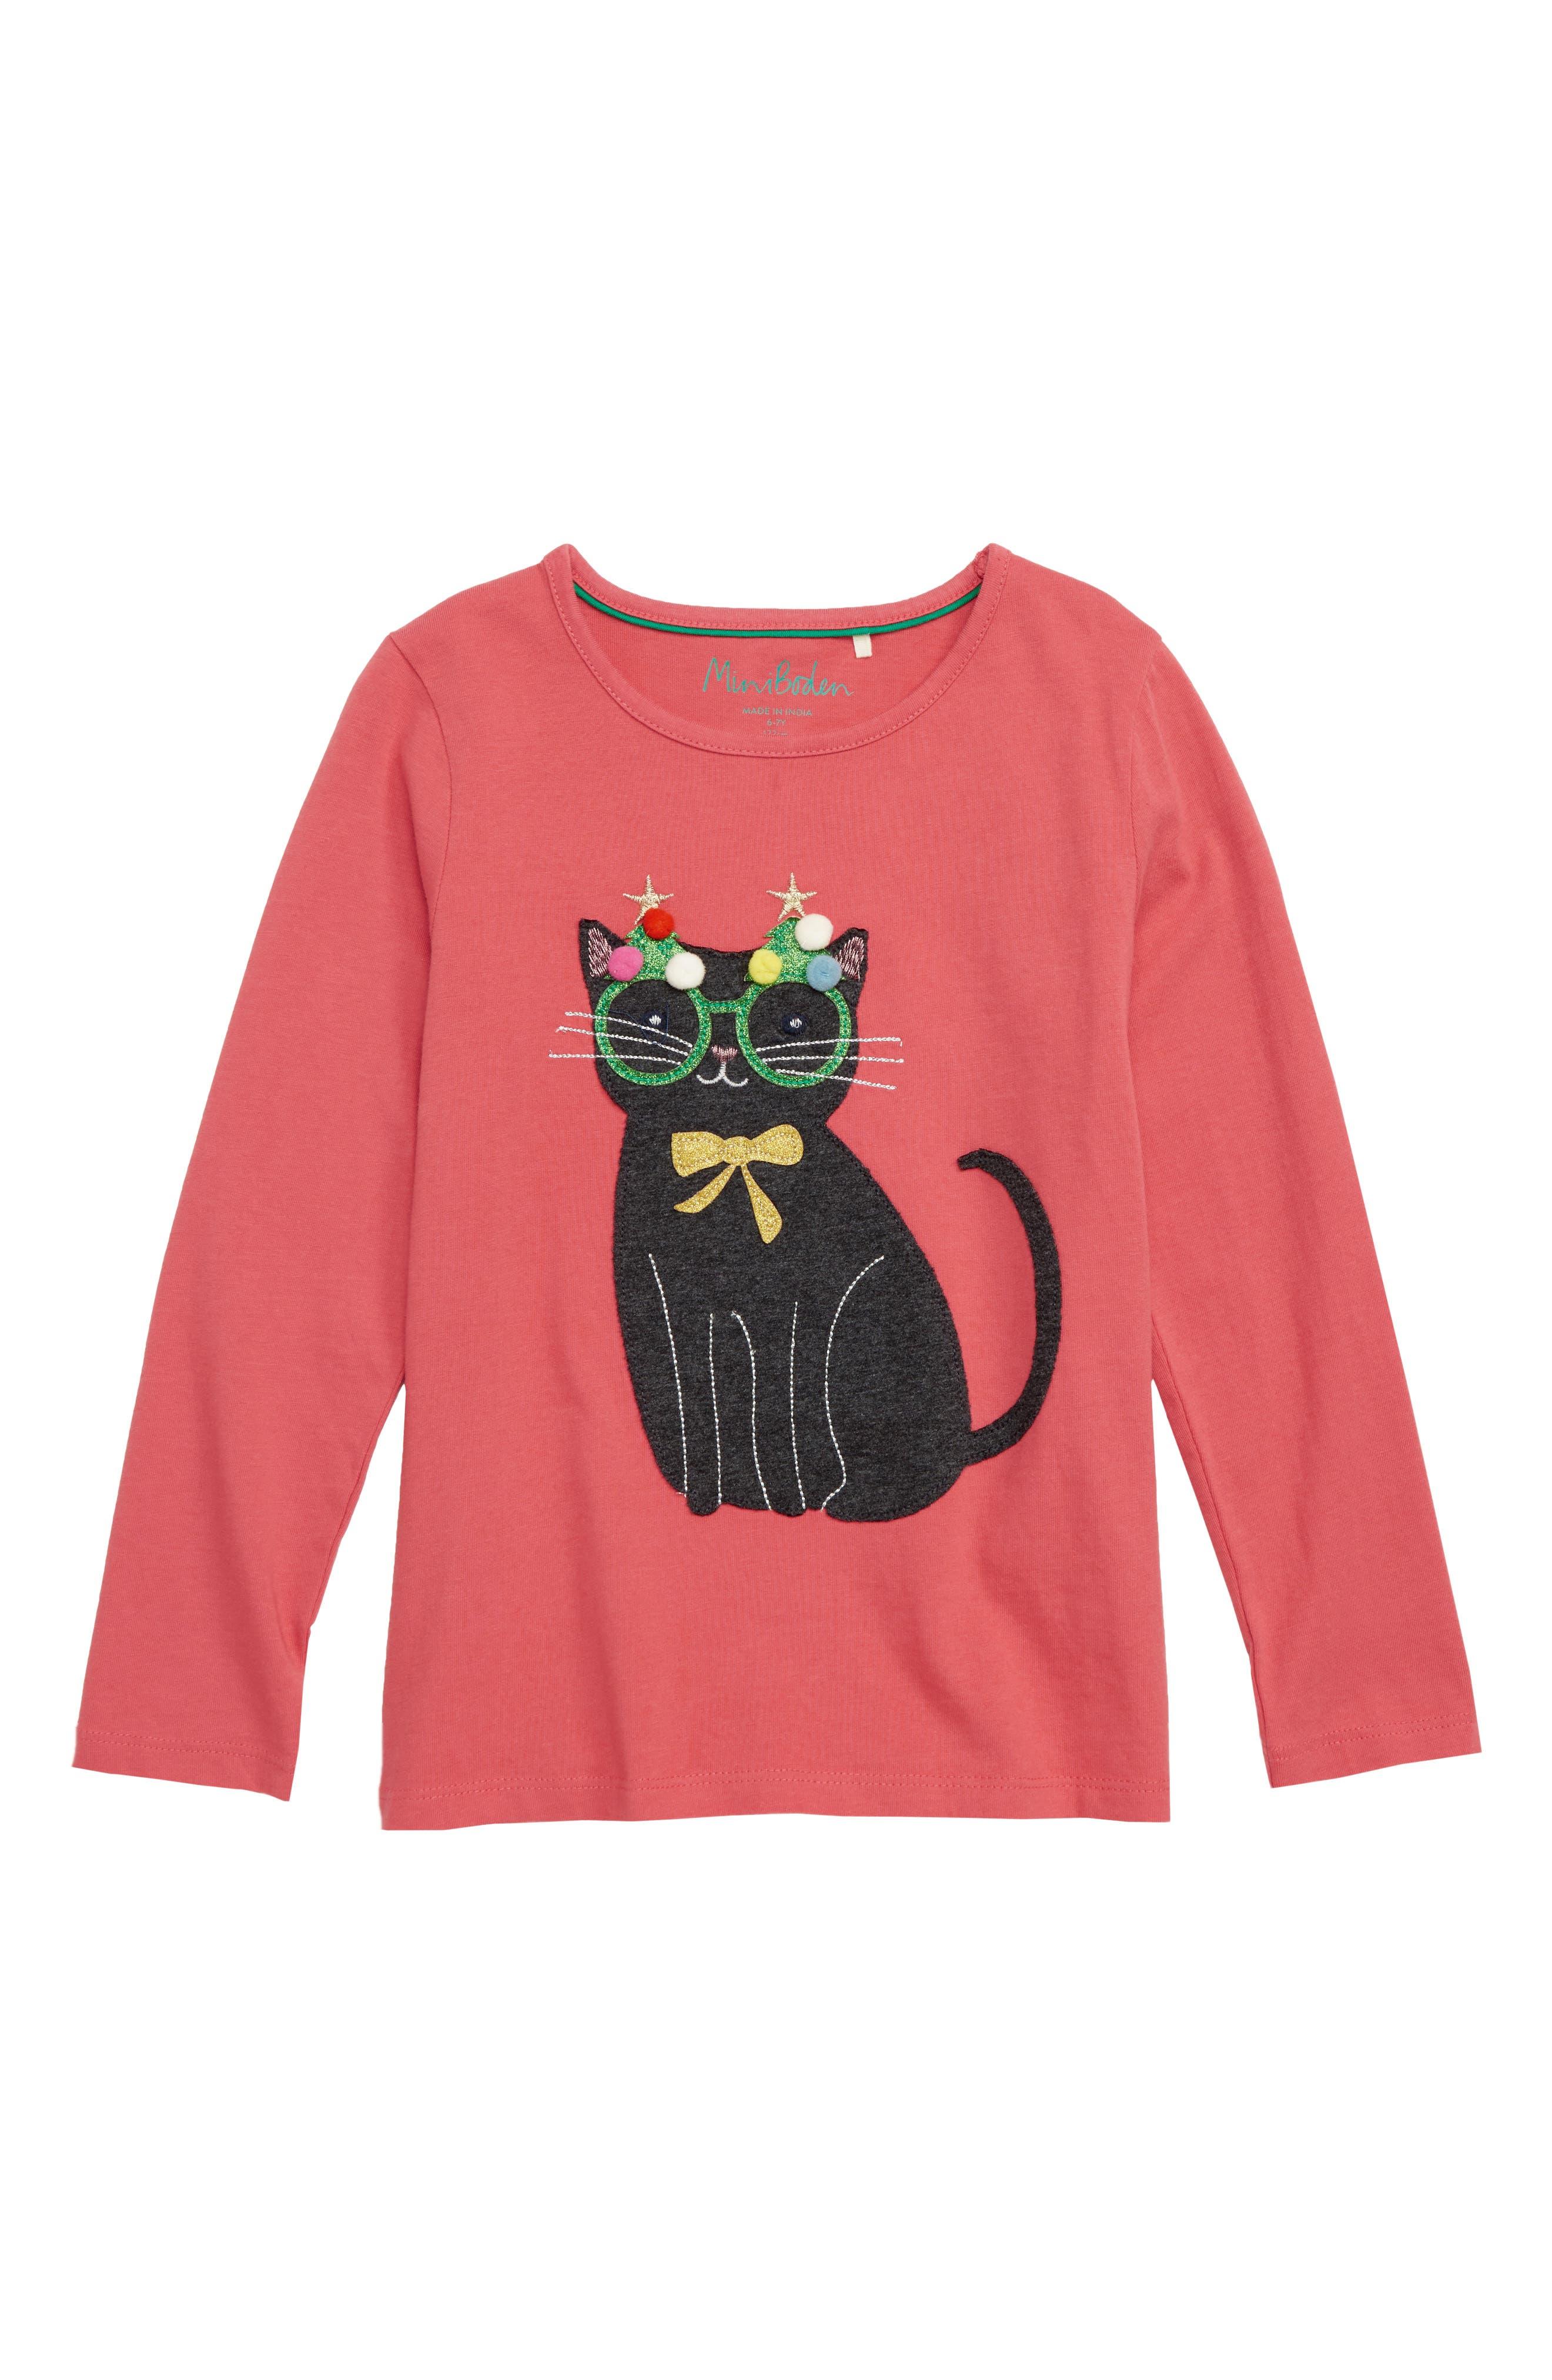 Mini Boden Festive Animals Tee,                             Main thumbnail 1, color,                             PNK ROSETTE PINK CAT